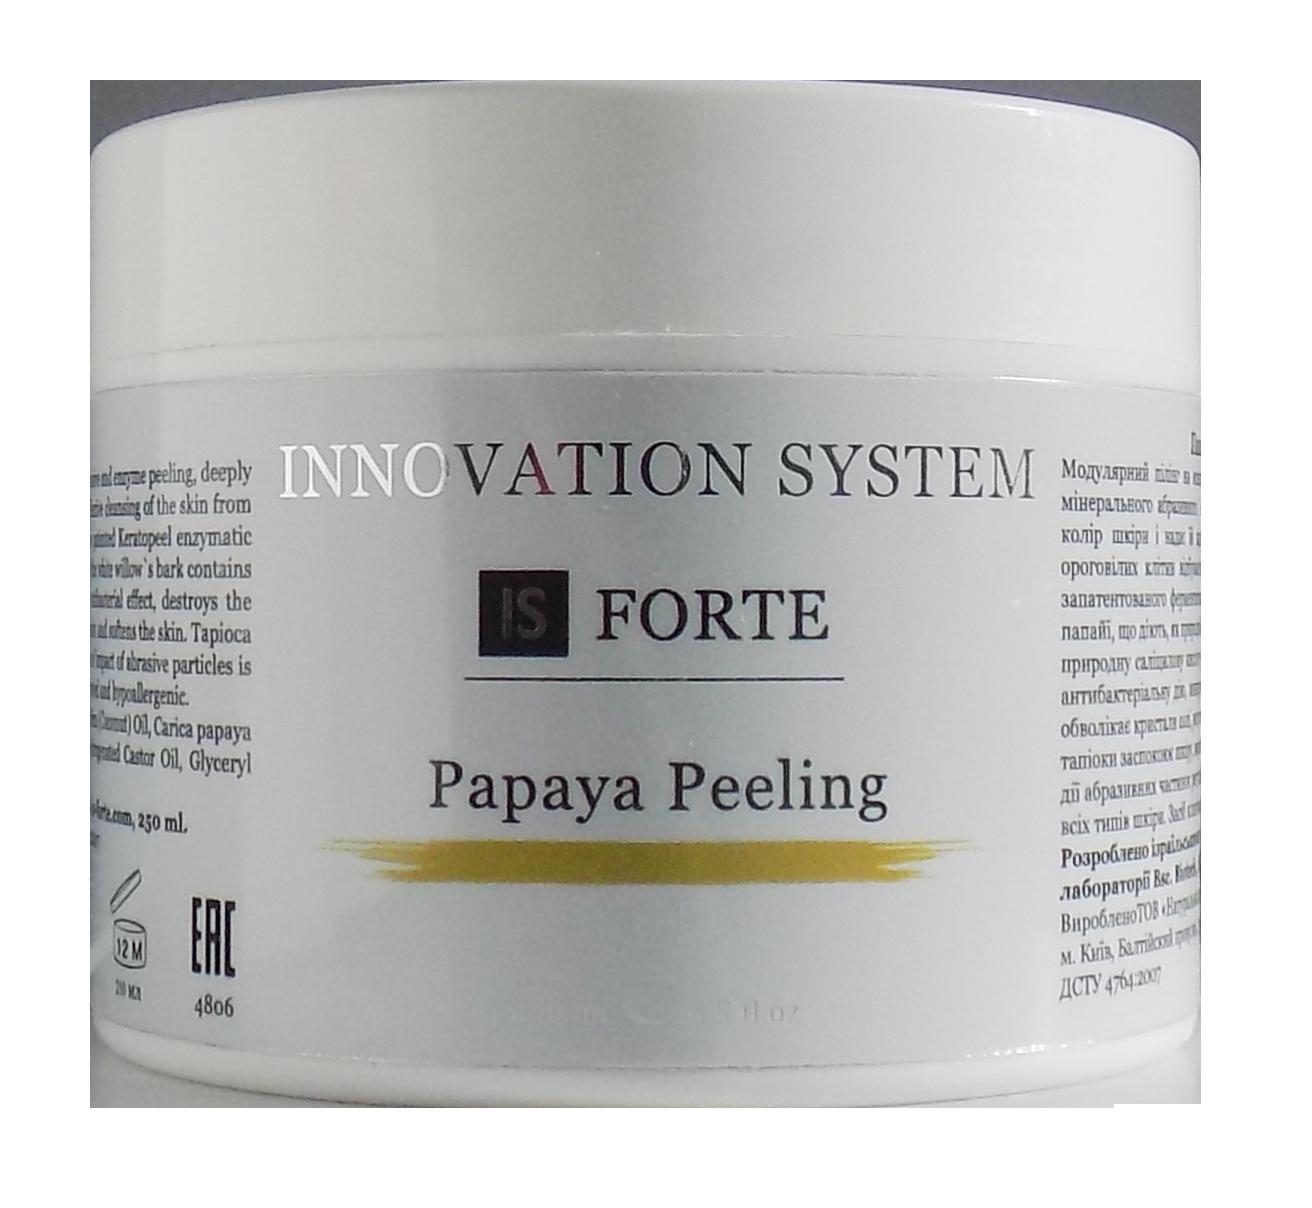 Папайя пилинг Форте / Papaya Peeling FORTE